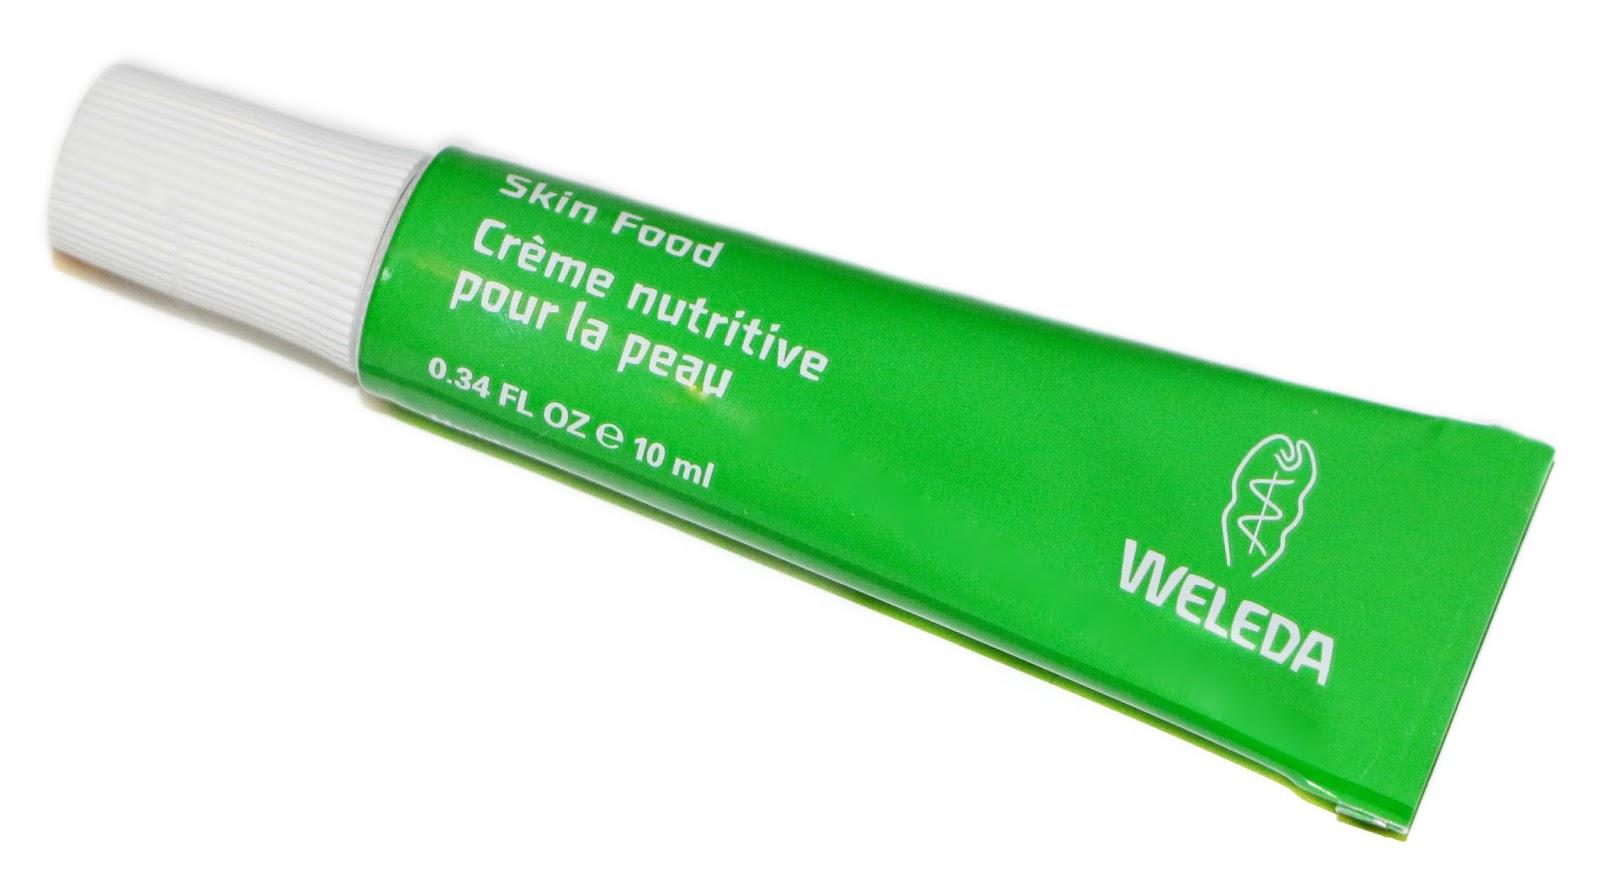 Review of Weleda Skin Food